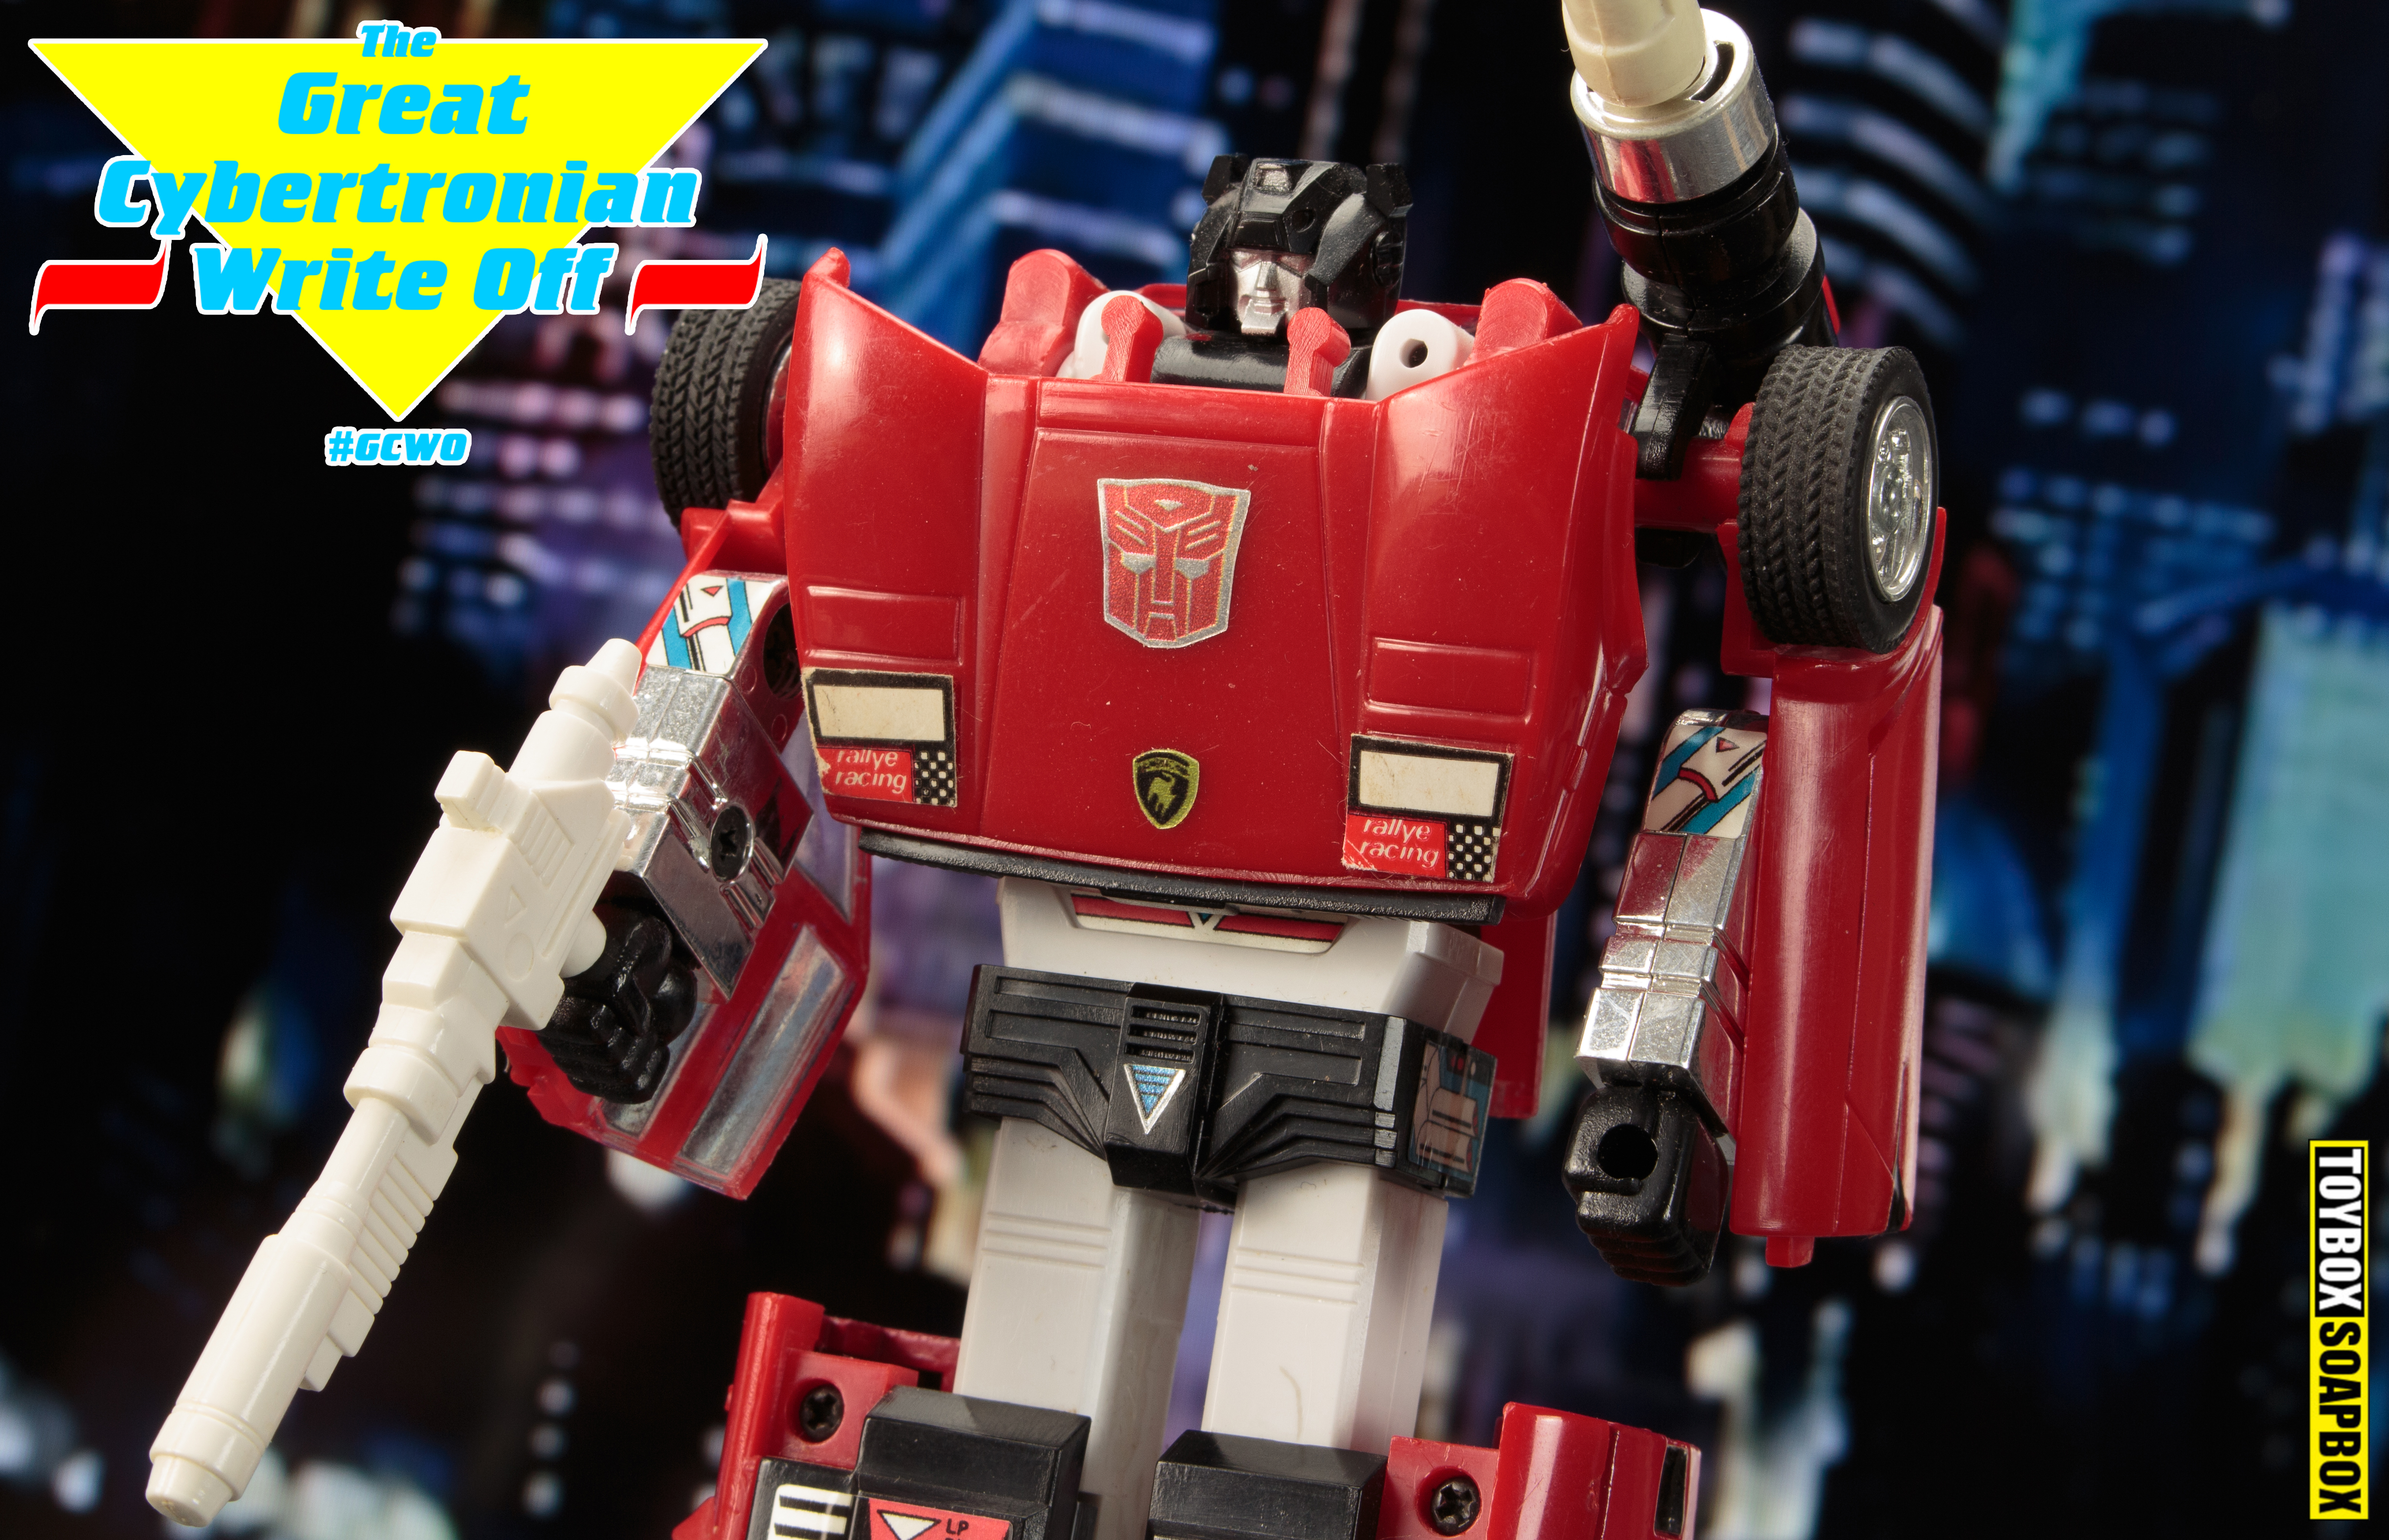 transformers-gcwo-great-cybertronian-write-off-1984